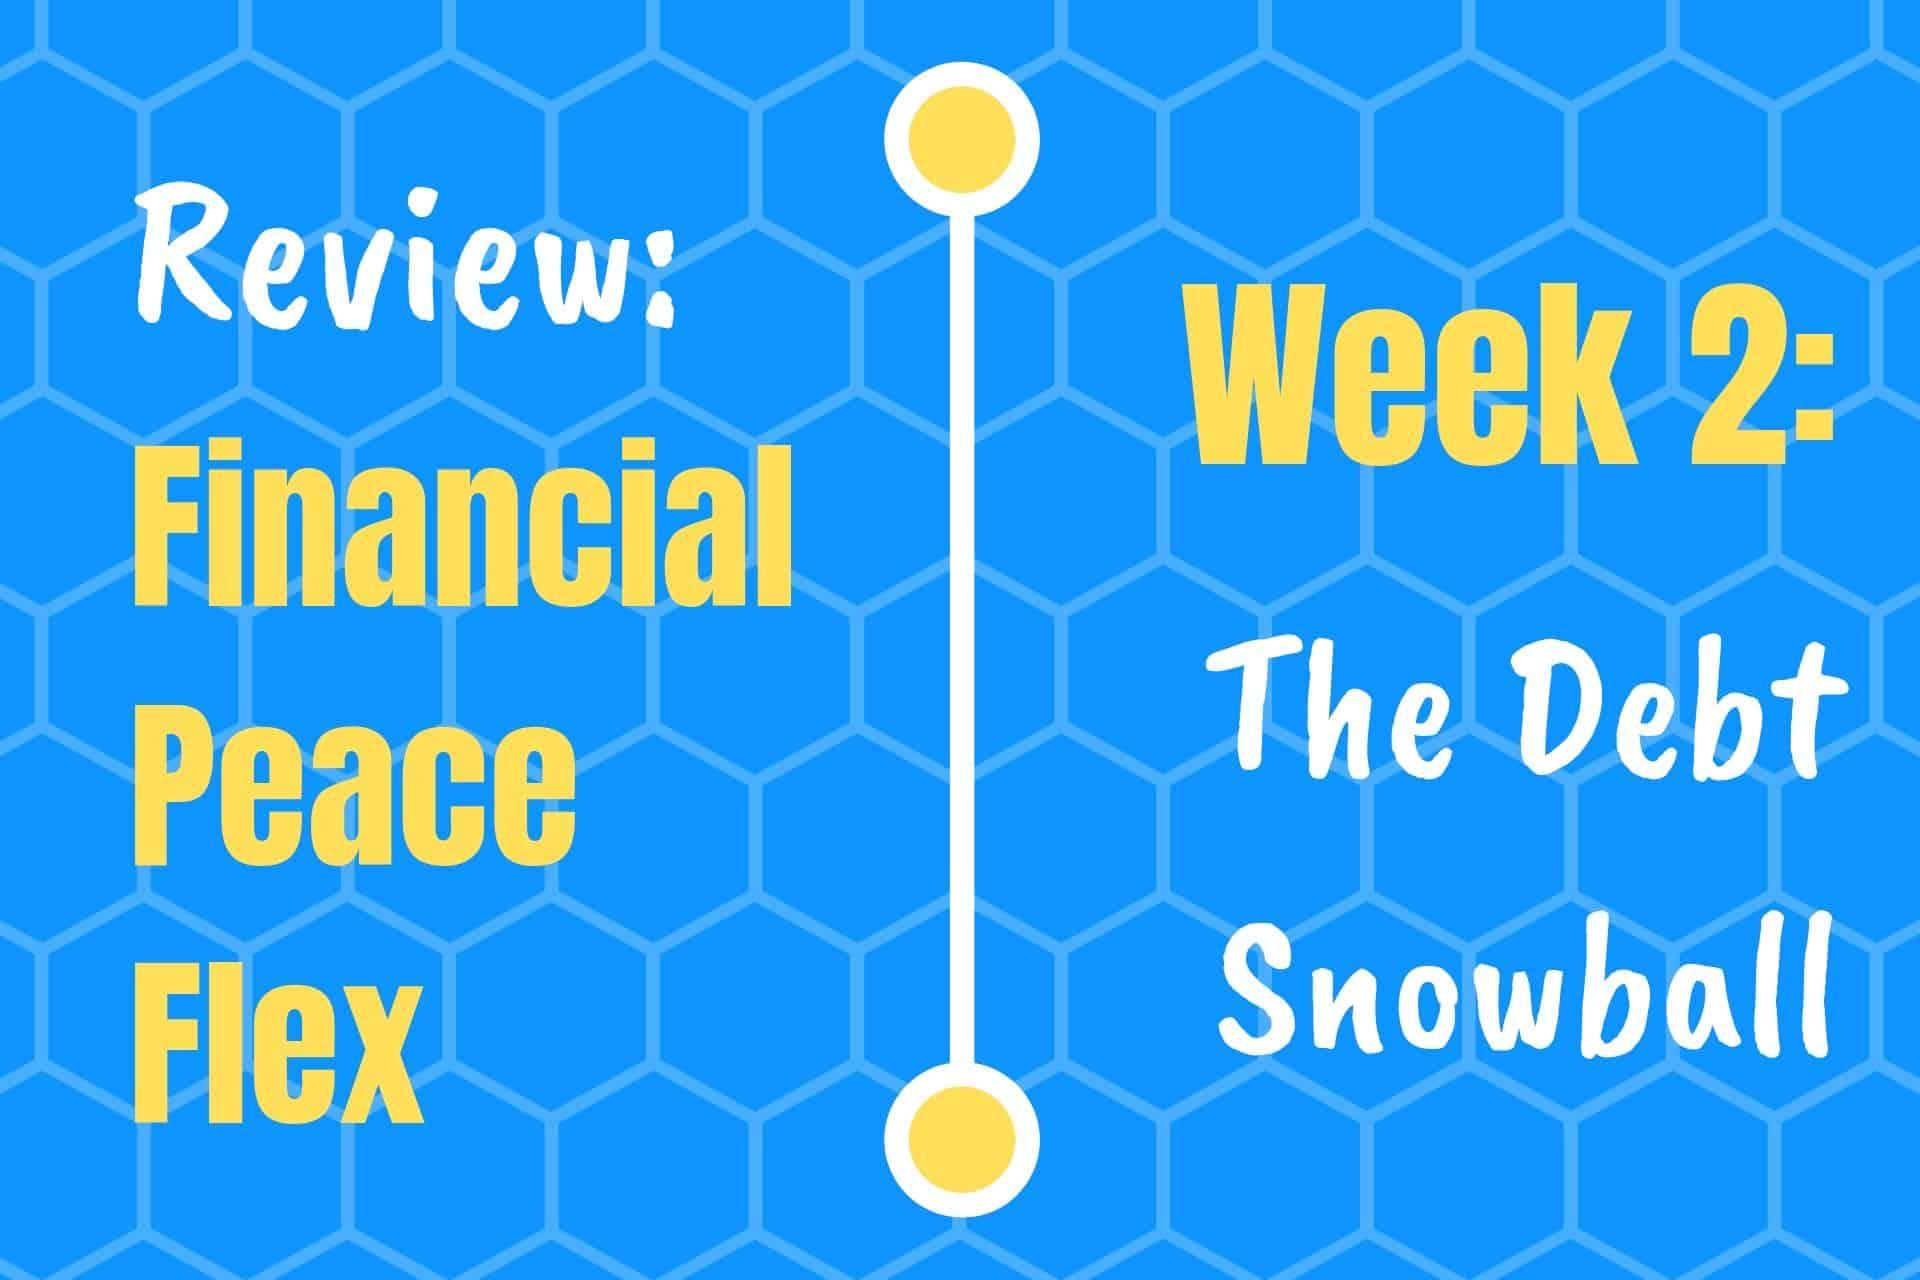 Financial Peace University Week 2 Post Image